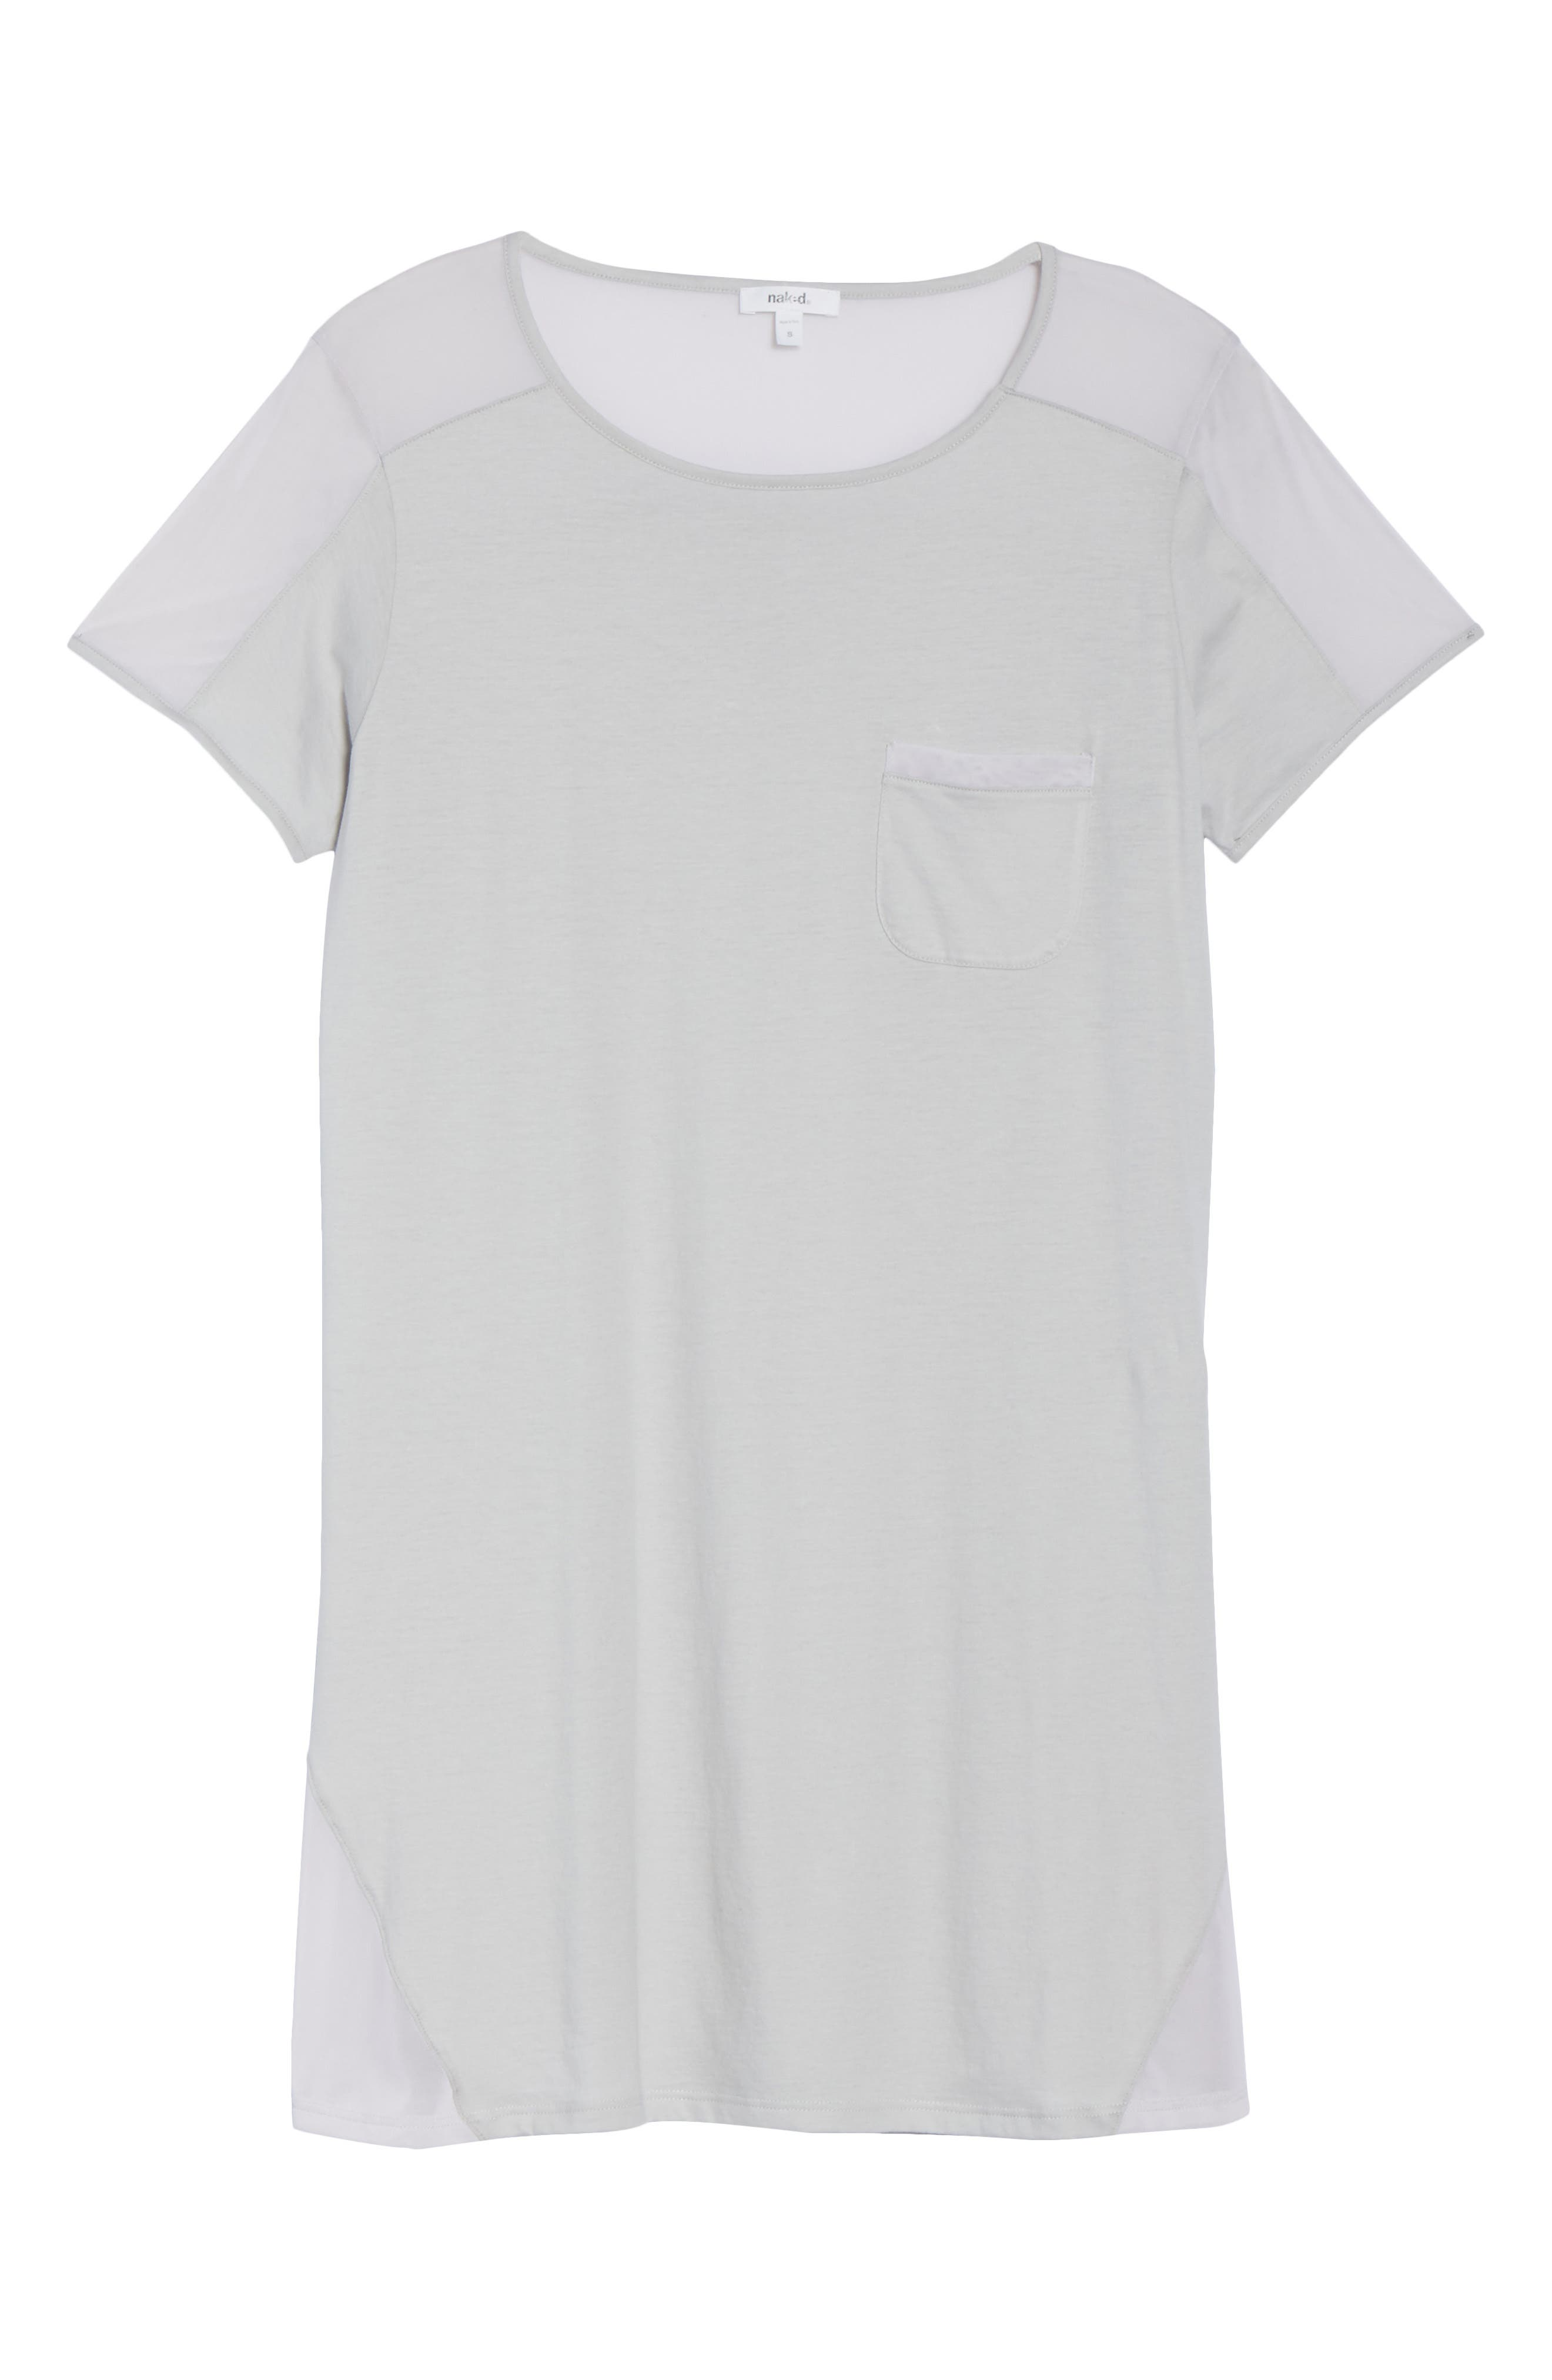 Cotton Sleep Shirt,                             Alternate thumbnail 6, color,                             Soft Gray